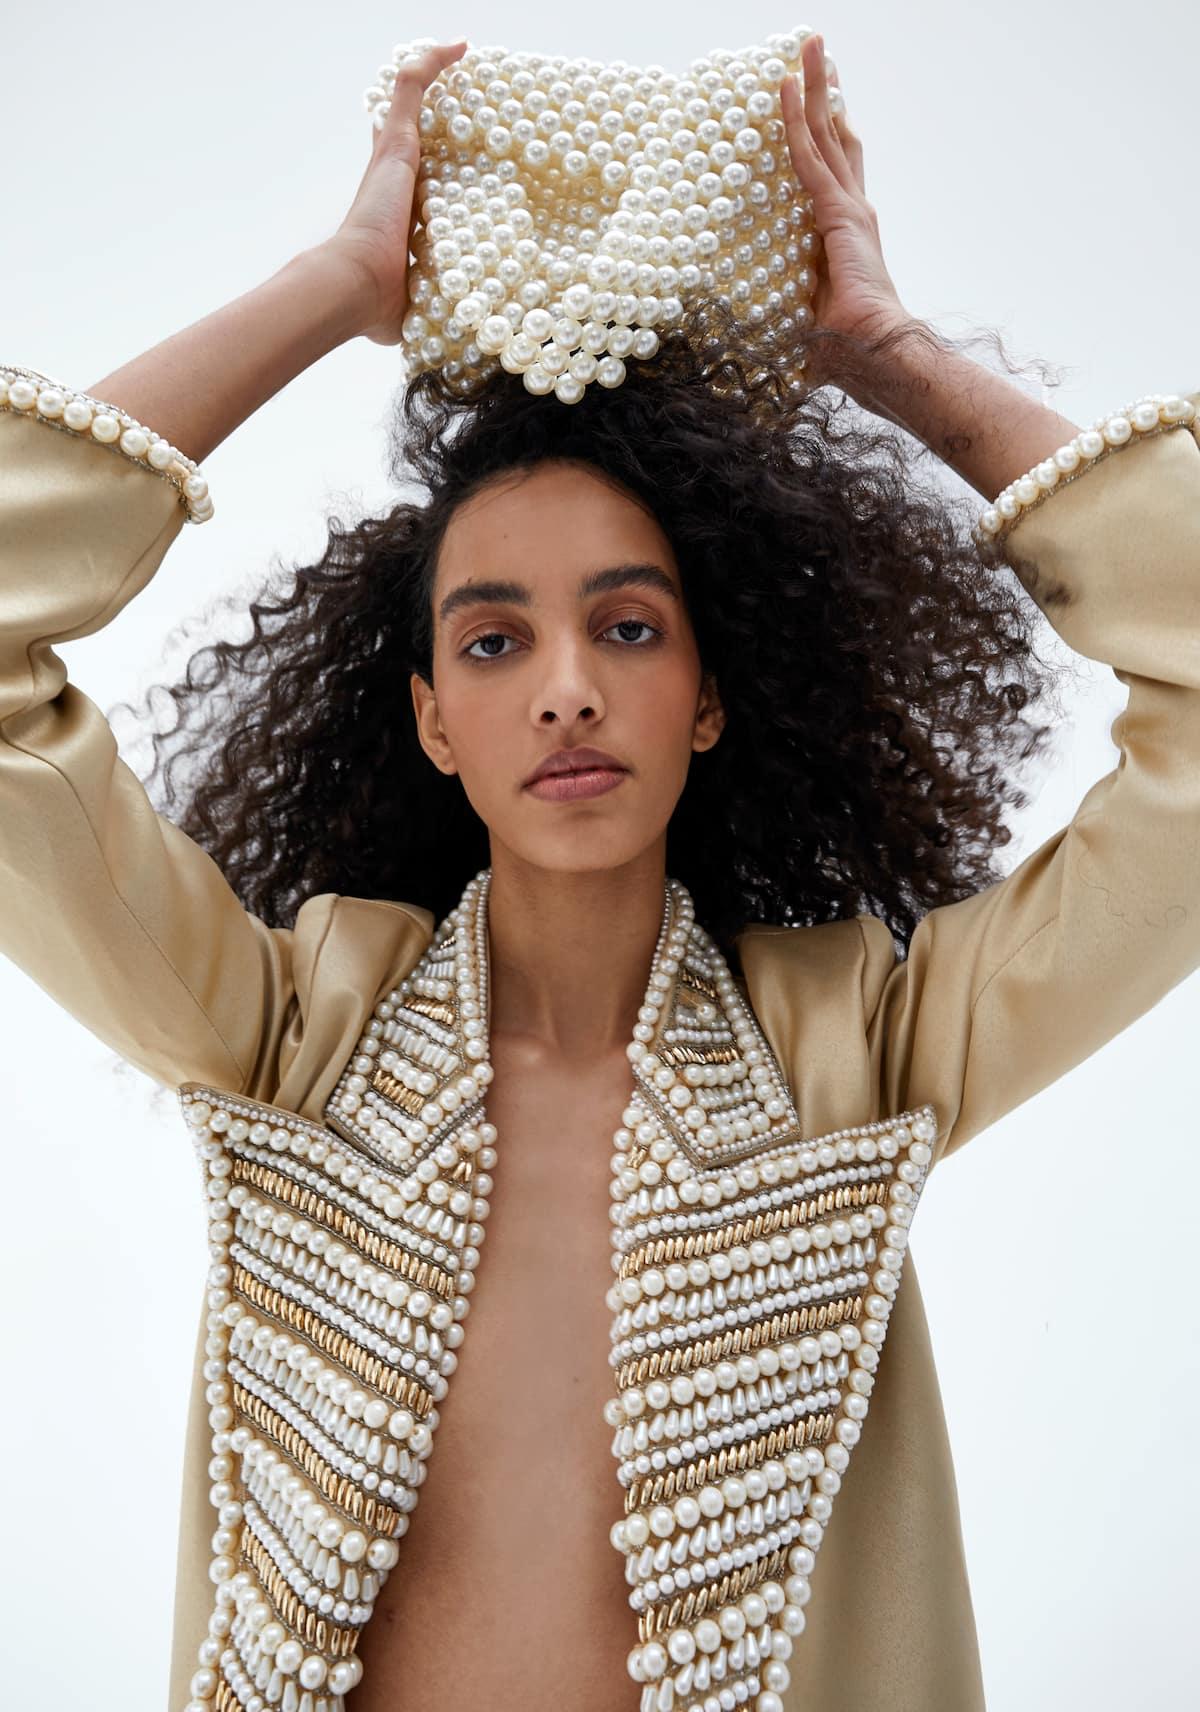 View 5 of model wearing Kismah Blazer in sand gold.